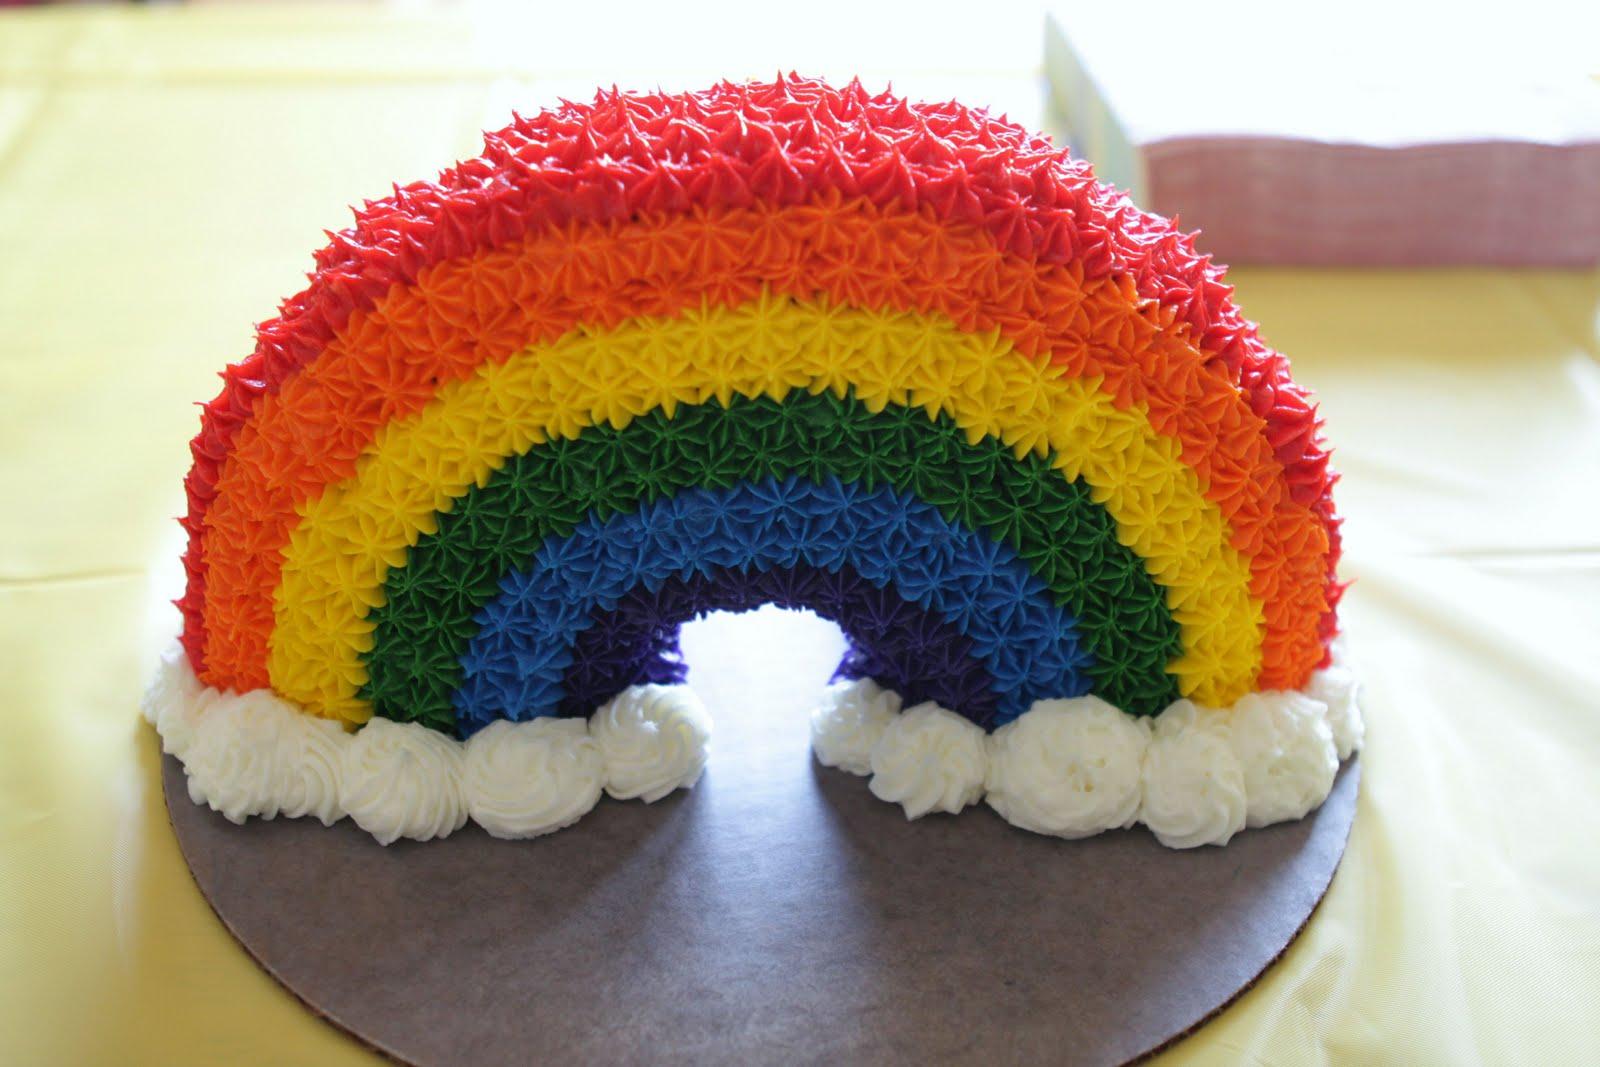 Rainbow Shaped Cake Recipe